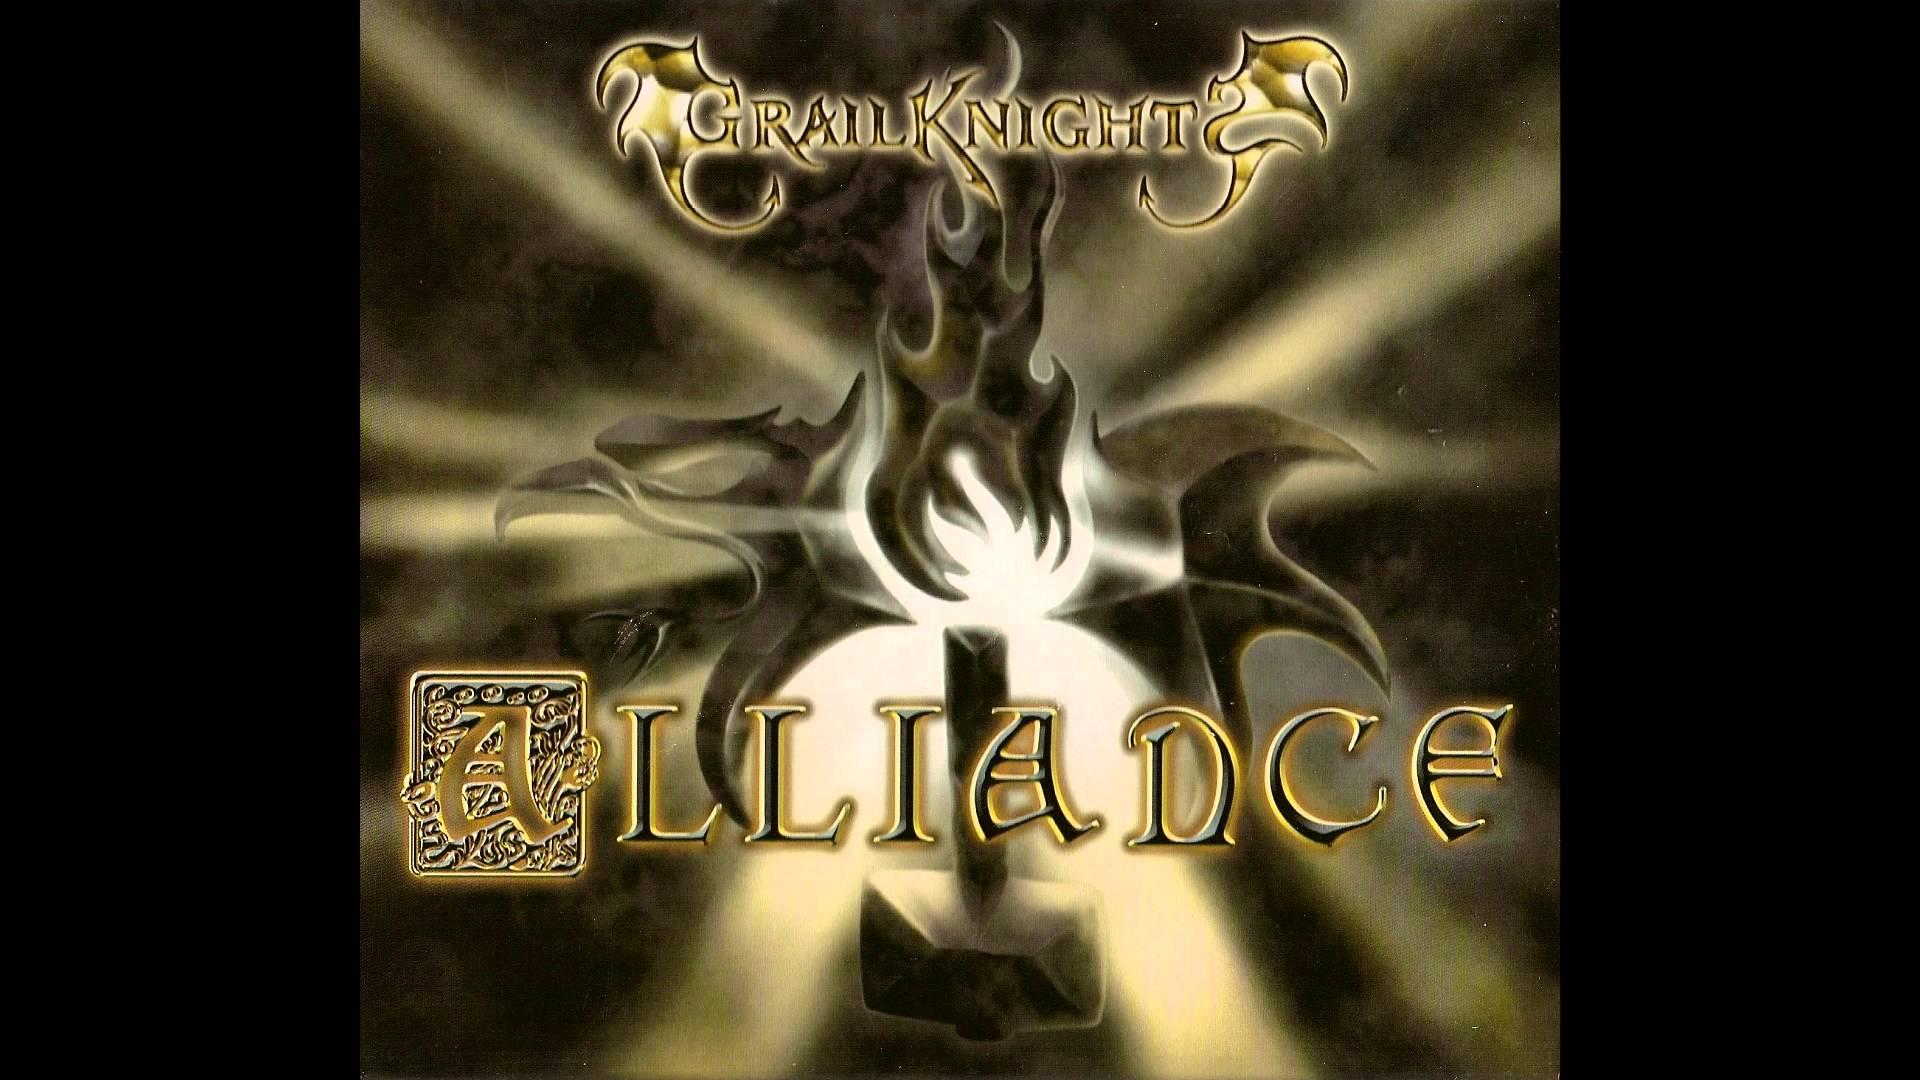 Grailknights - Alliance (Full album HQ)